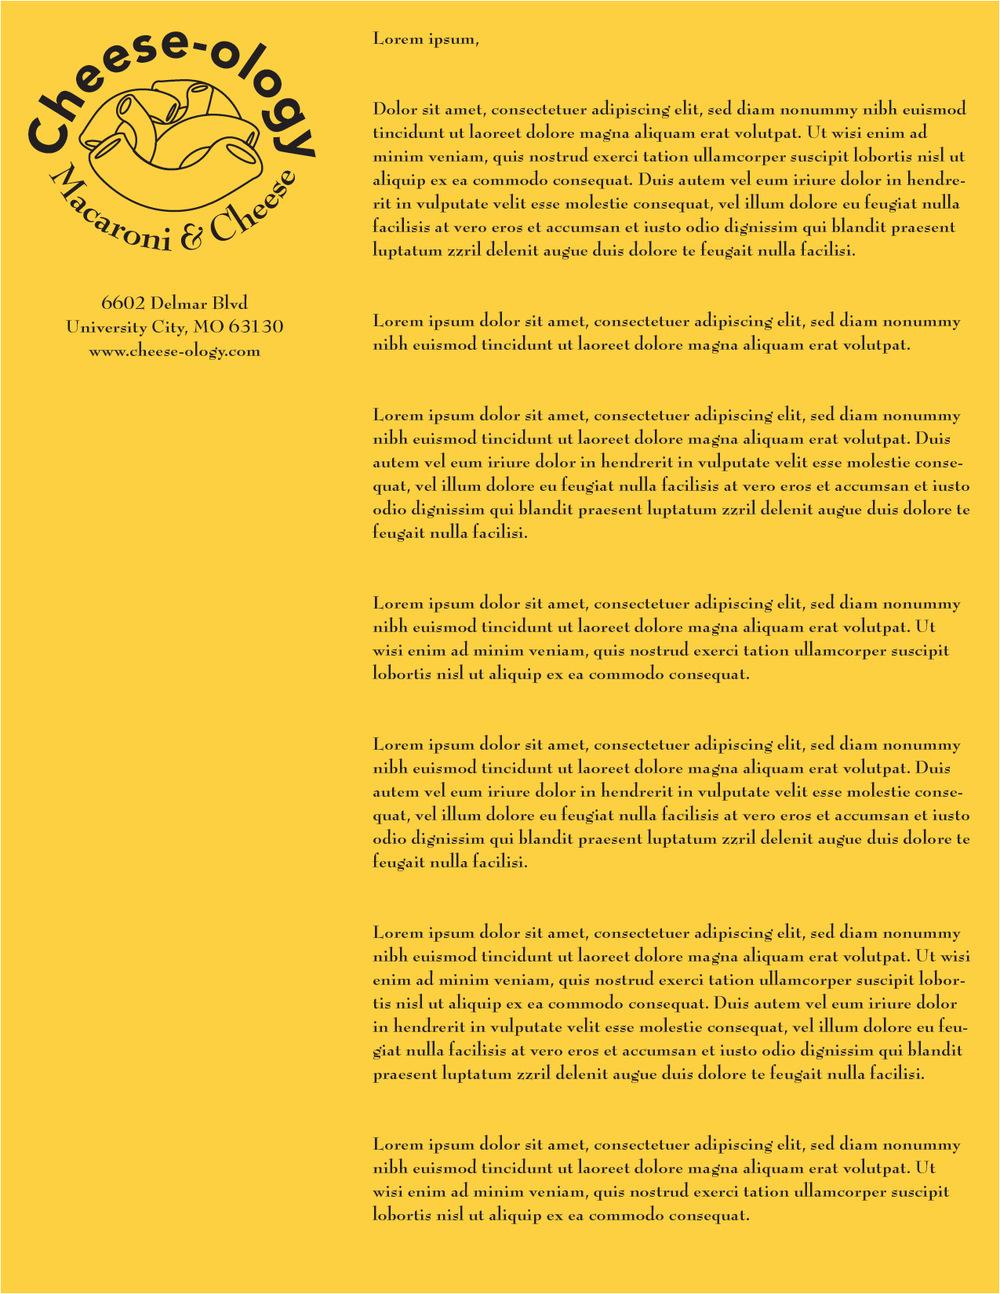 Artist Pen - Cheeselogo letterhead example